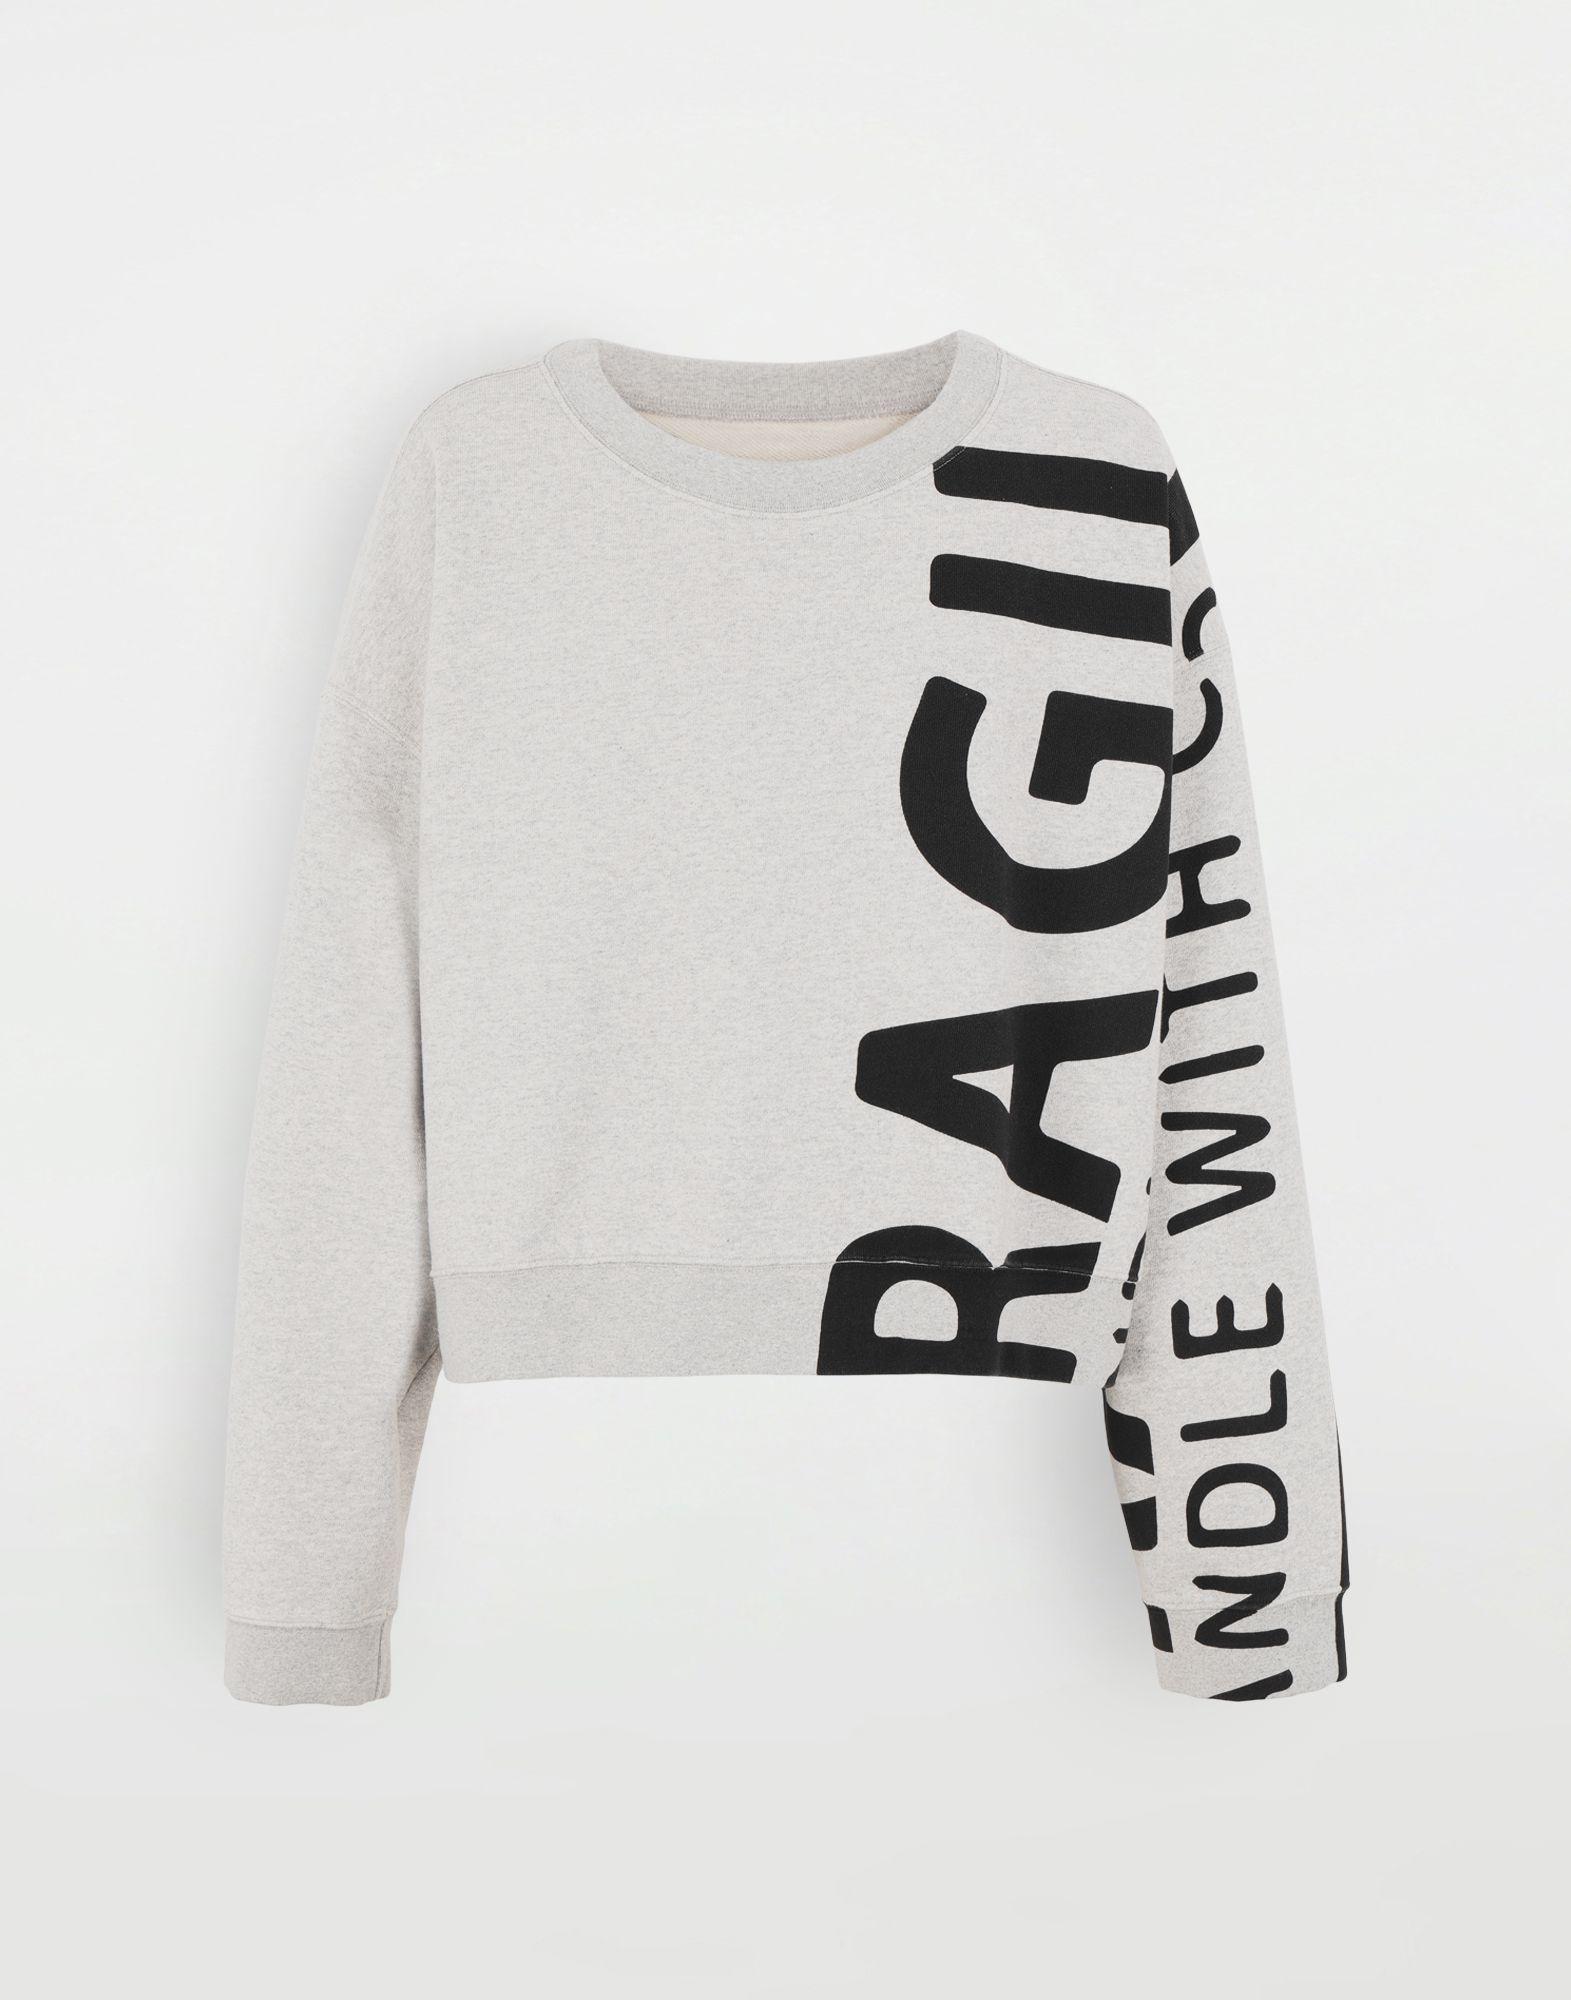 MAISON MARGIELA Sweatshirt 'Fragile' Sweatshirt Herr f